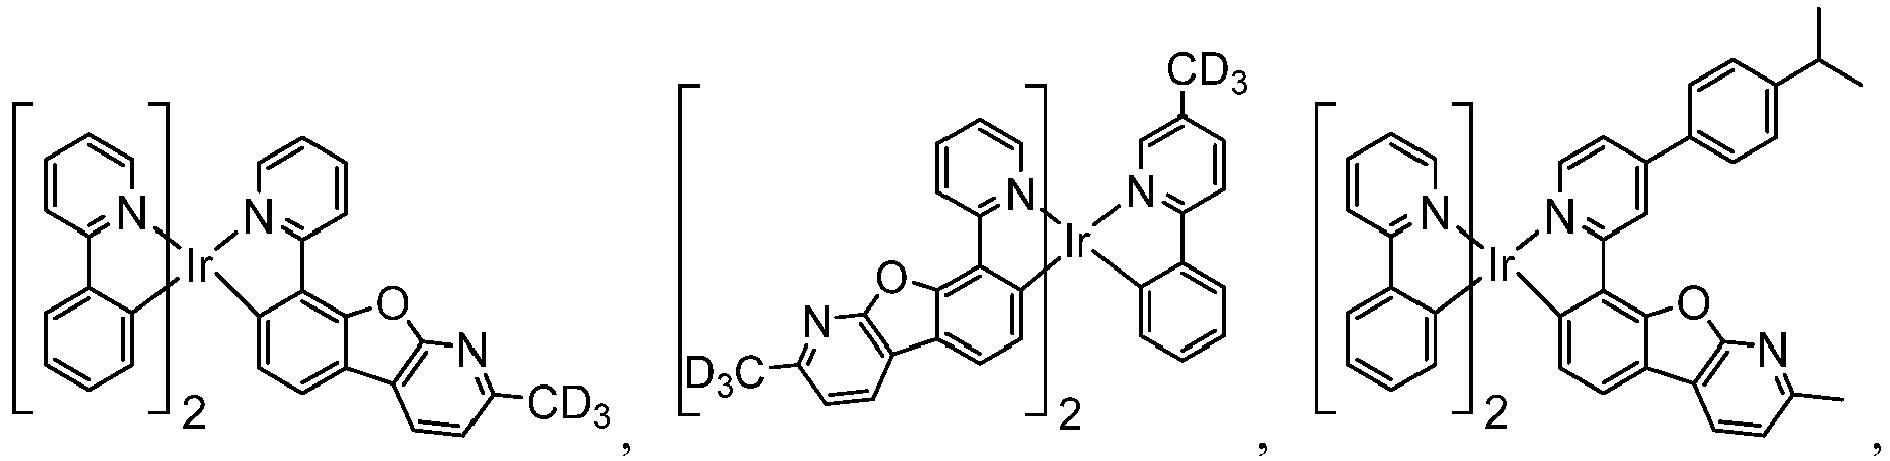 Figure imgb0920